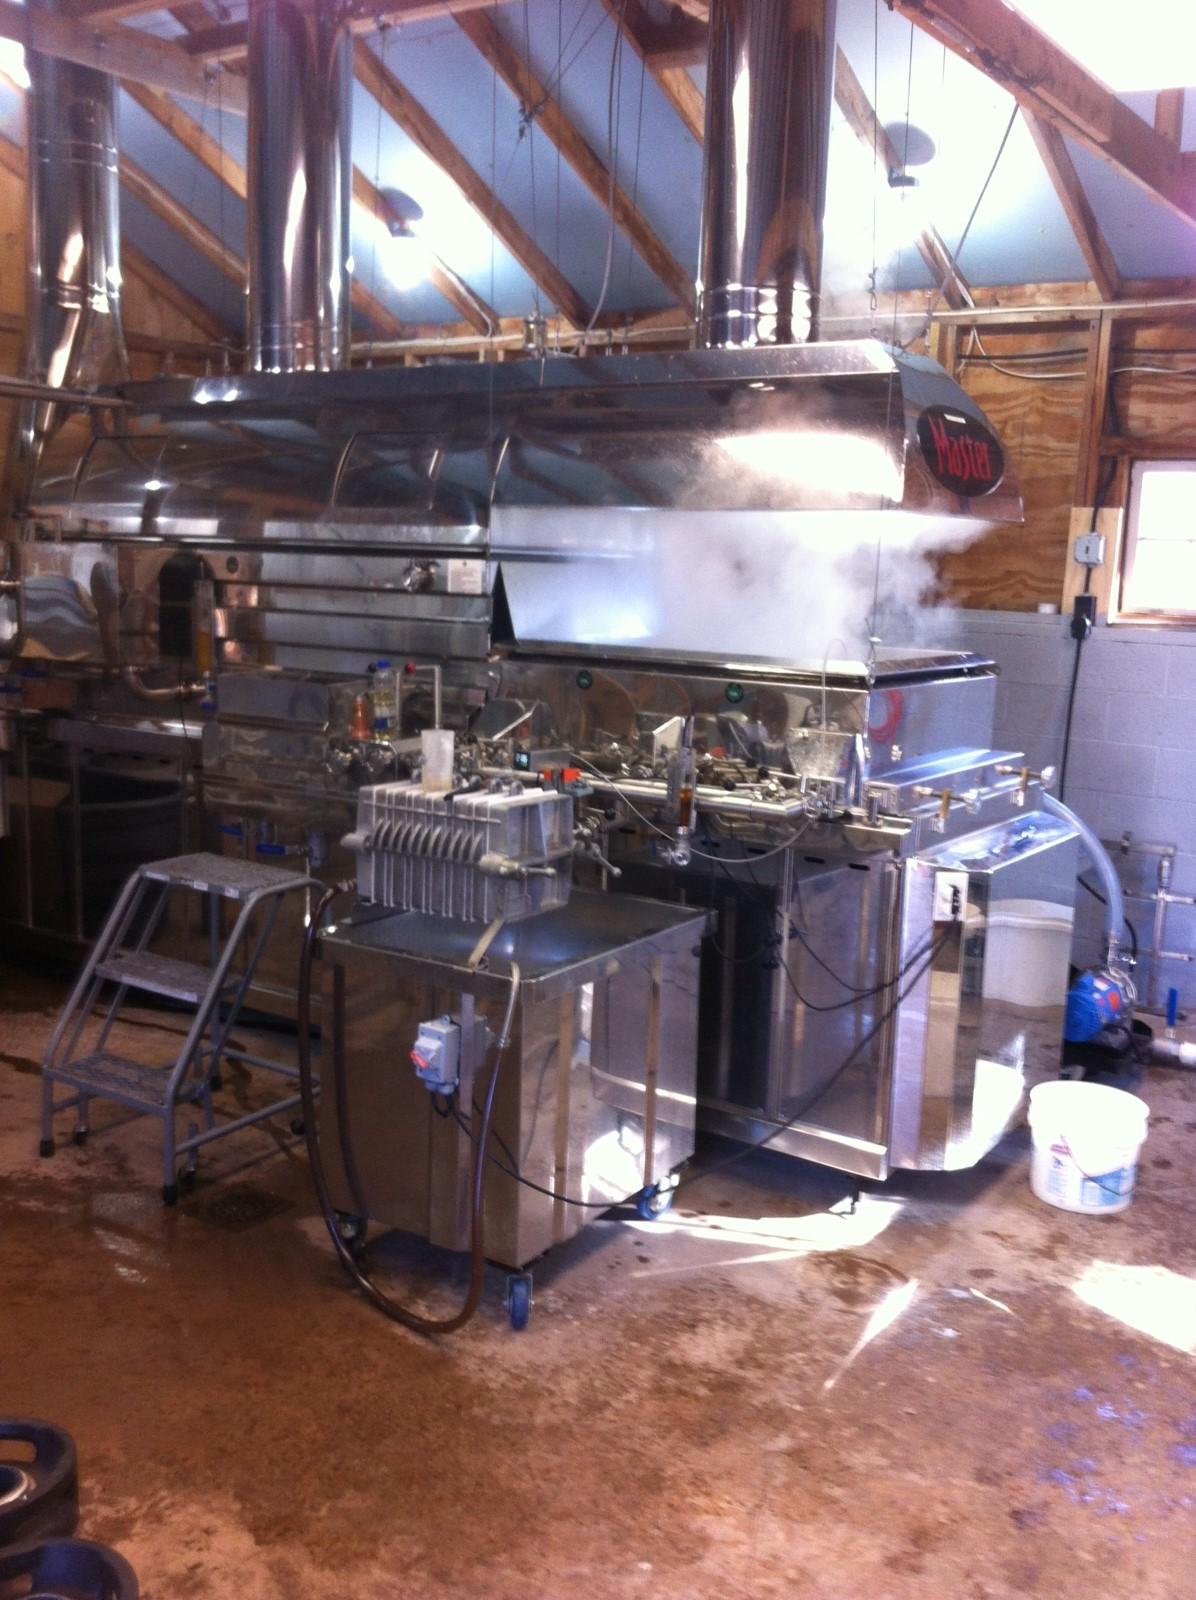 The evaporator boiling the sap